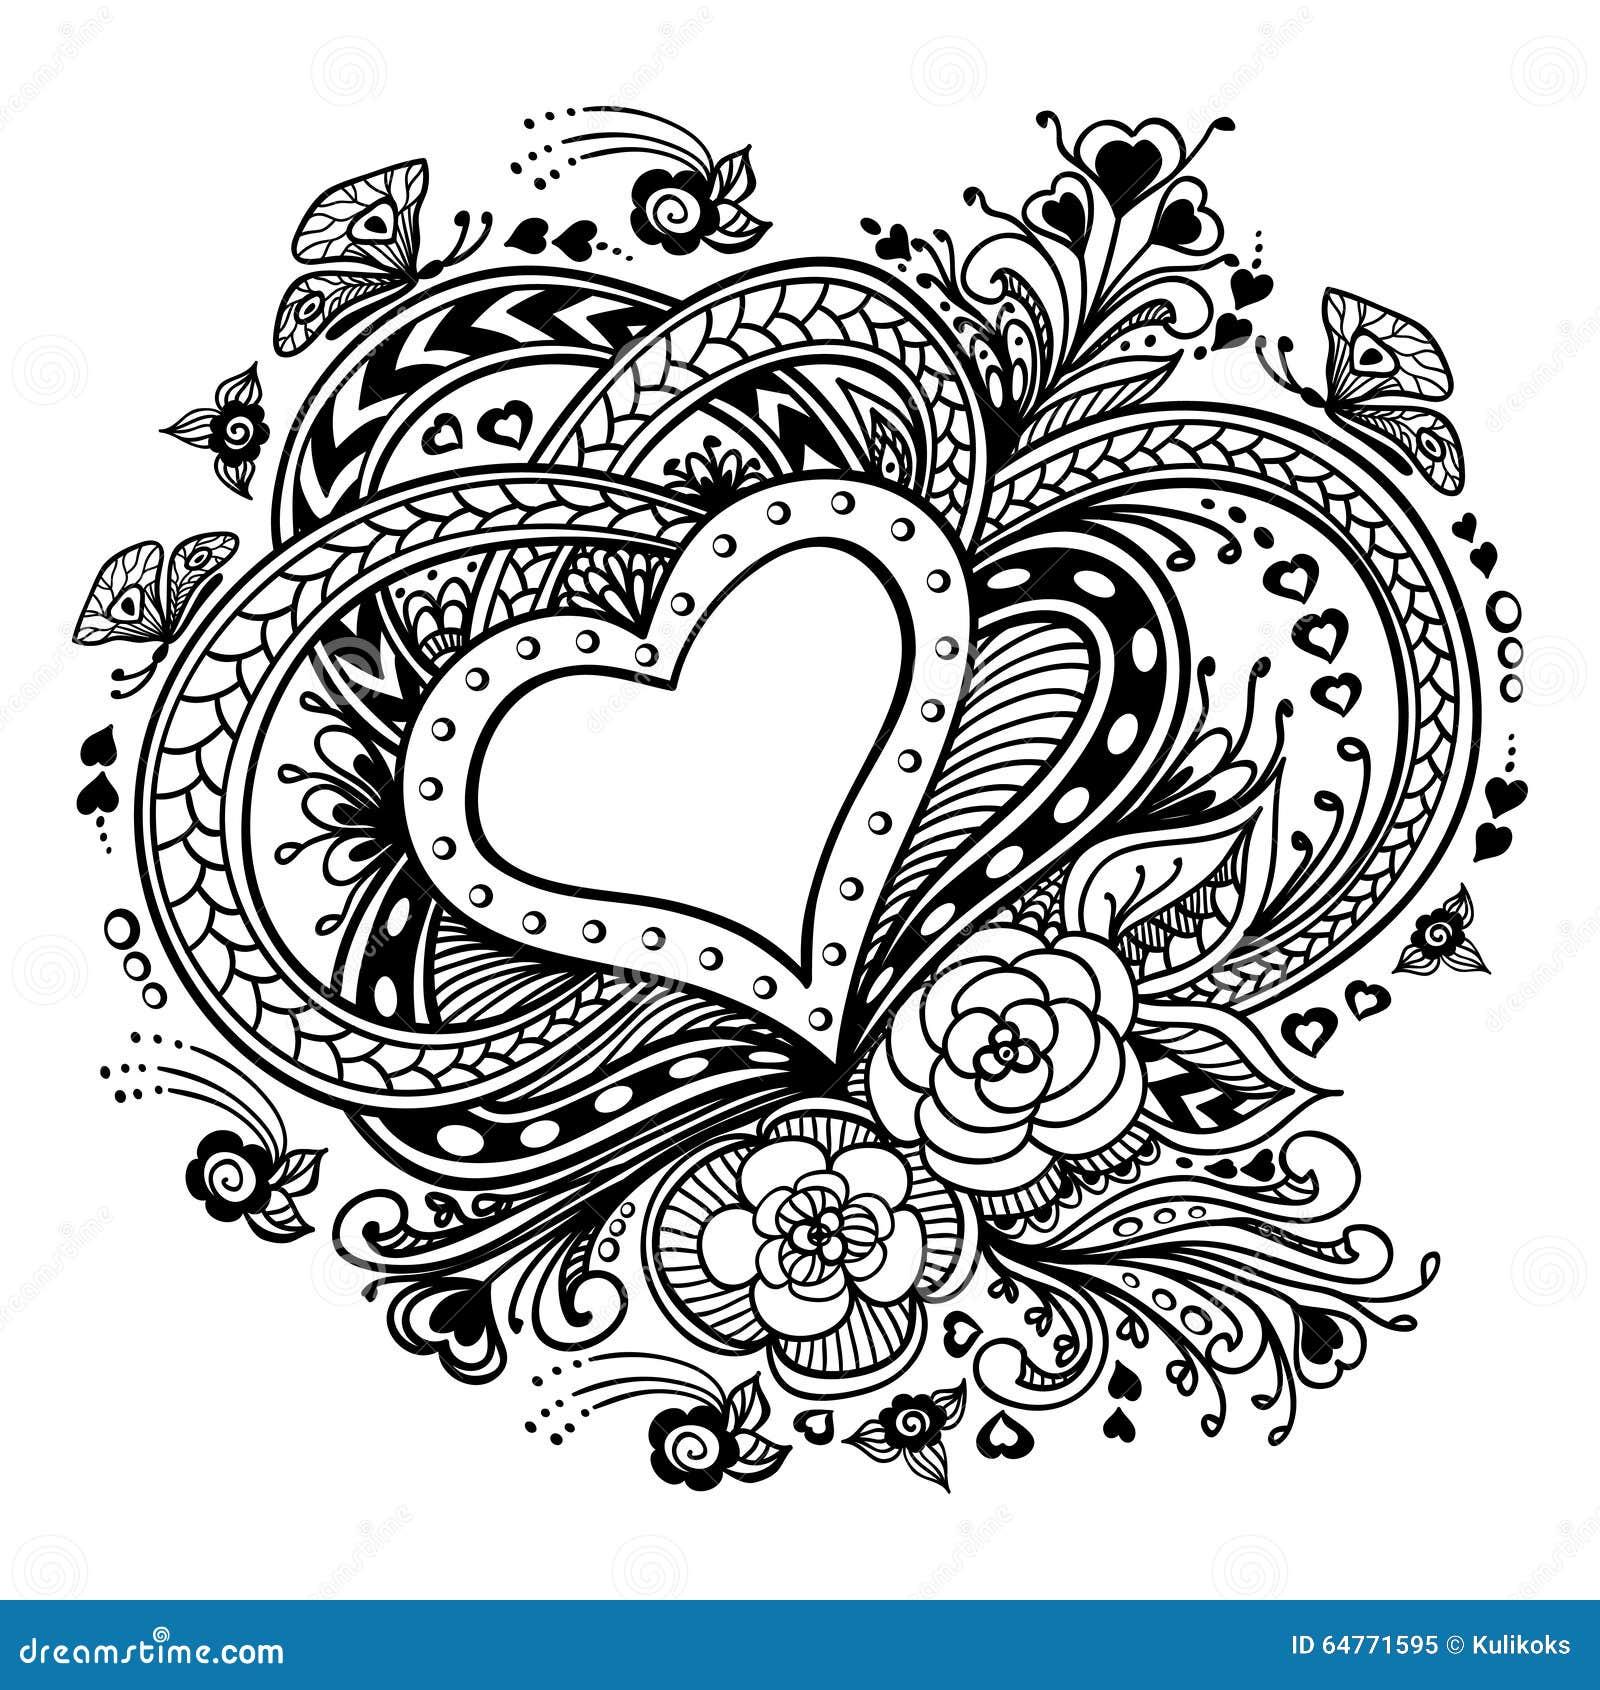 Zen-doodle Heart Frame With Flowers Butterflies Black On White Stock ...